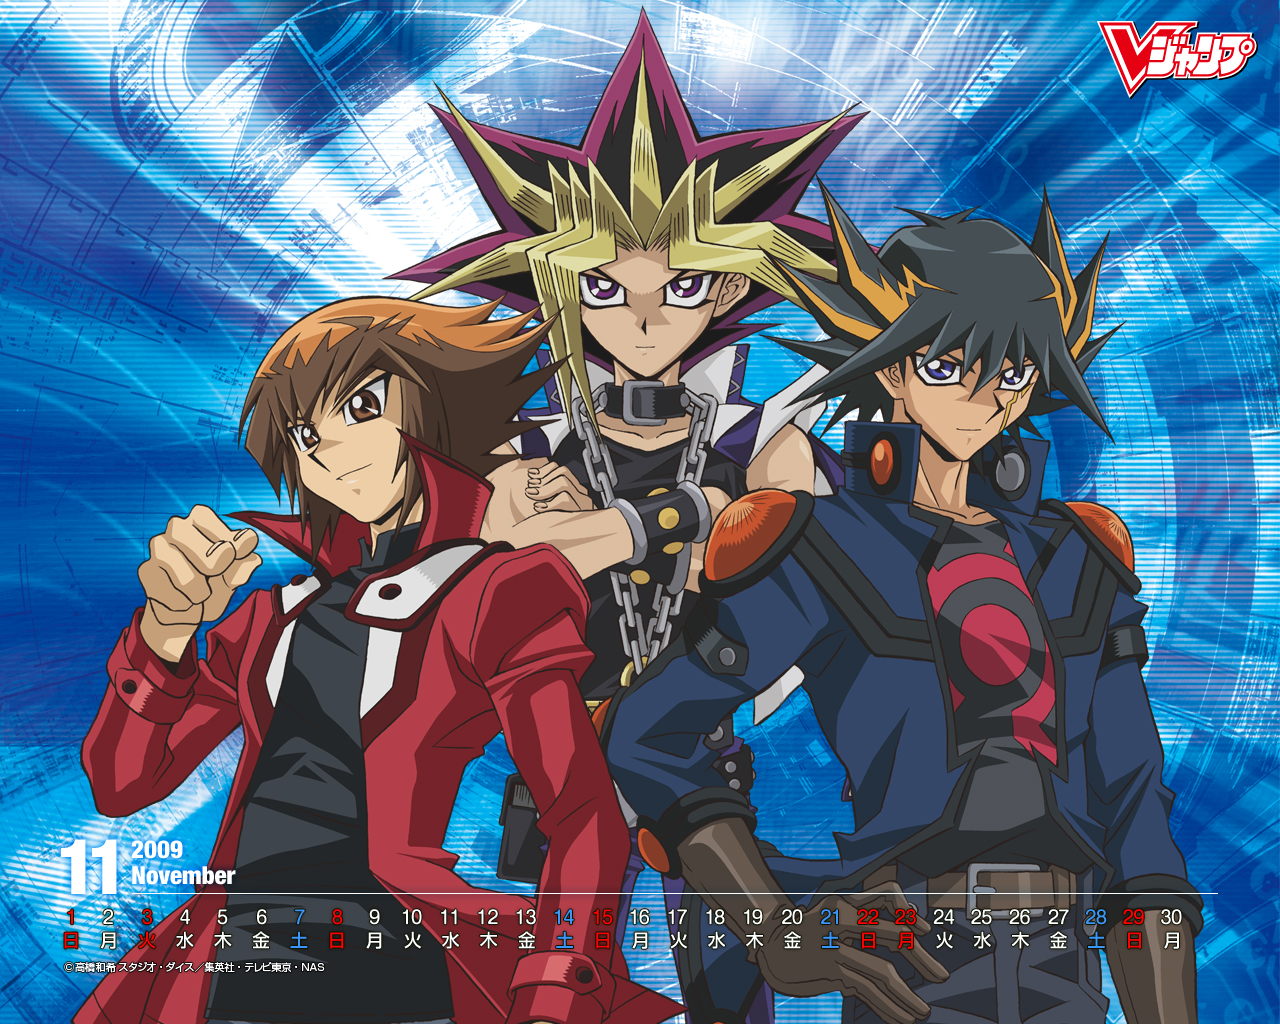 Jaden Yami Atem and Yusei   The Anime Kingdom Wallpaper 1280x1024